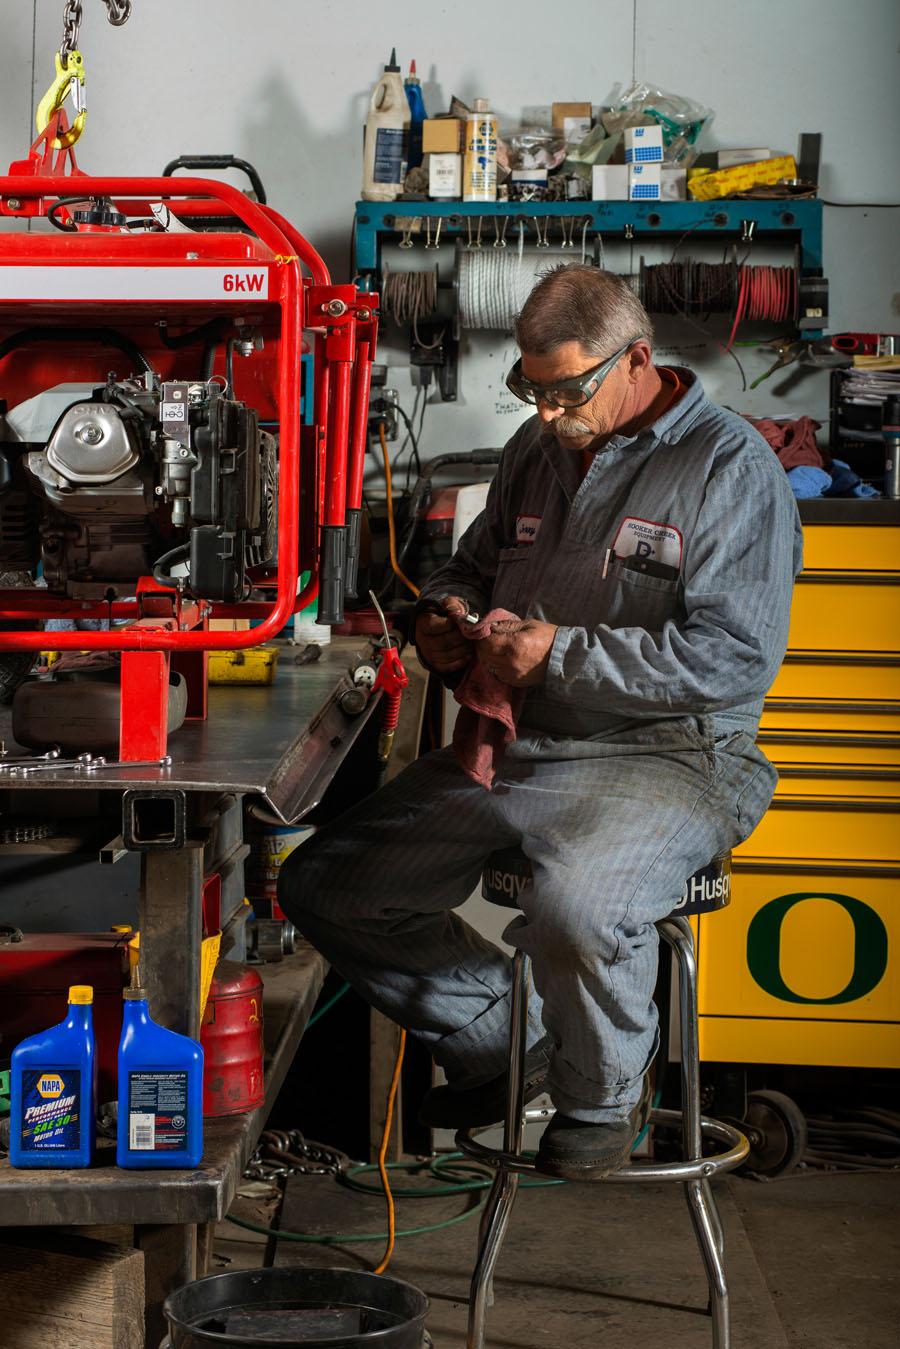 Construction Equipment Repair & Servicing